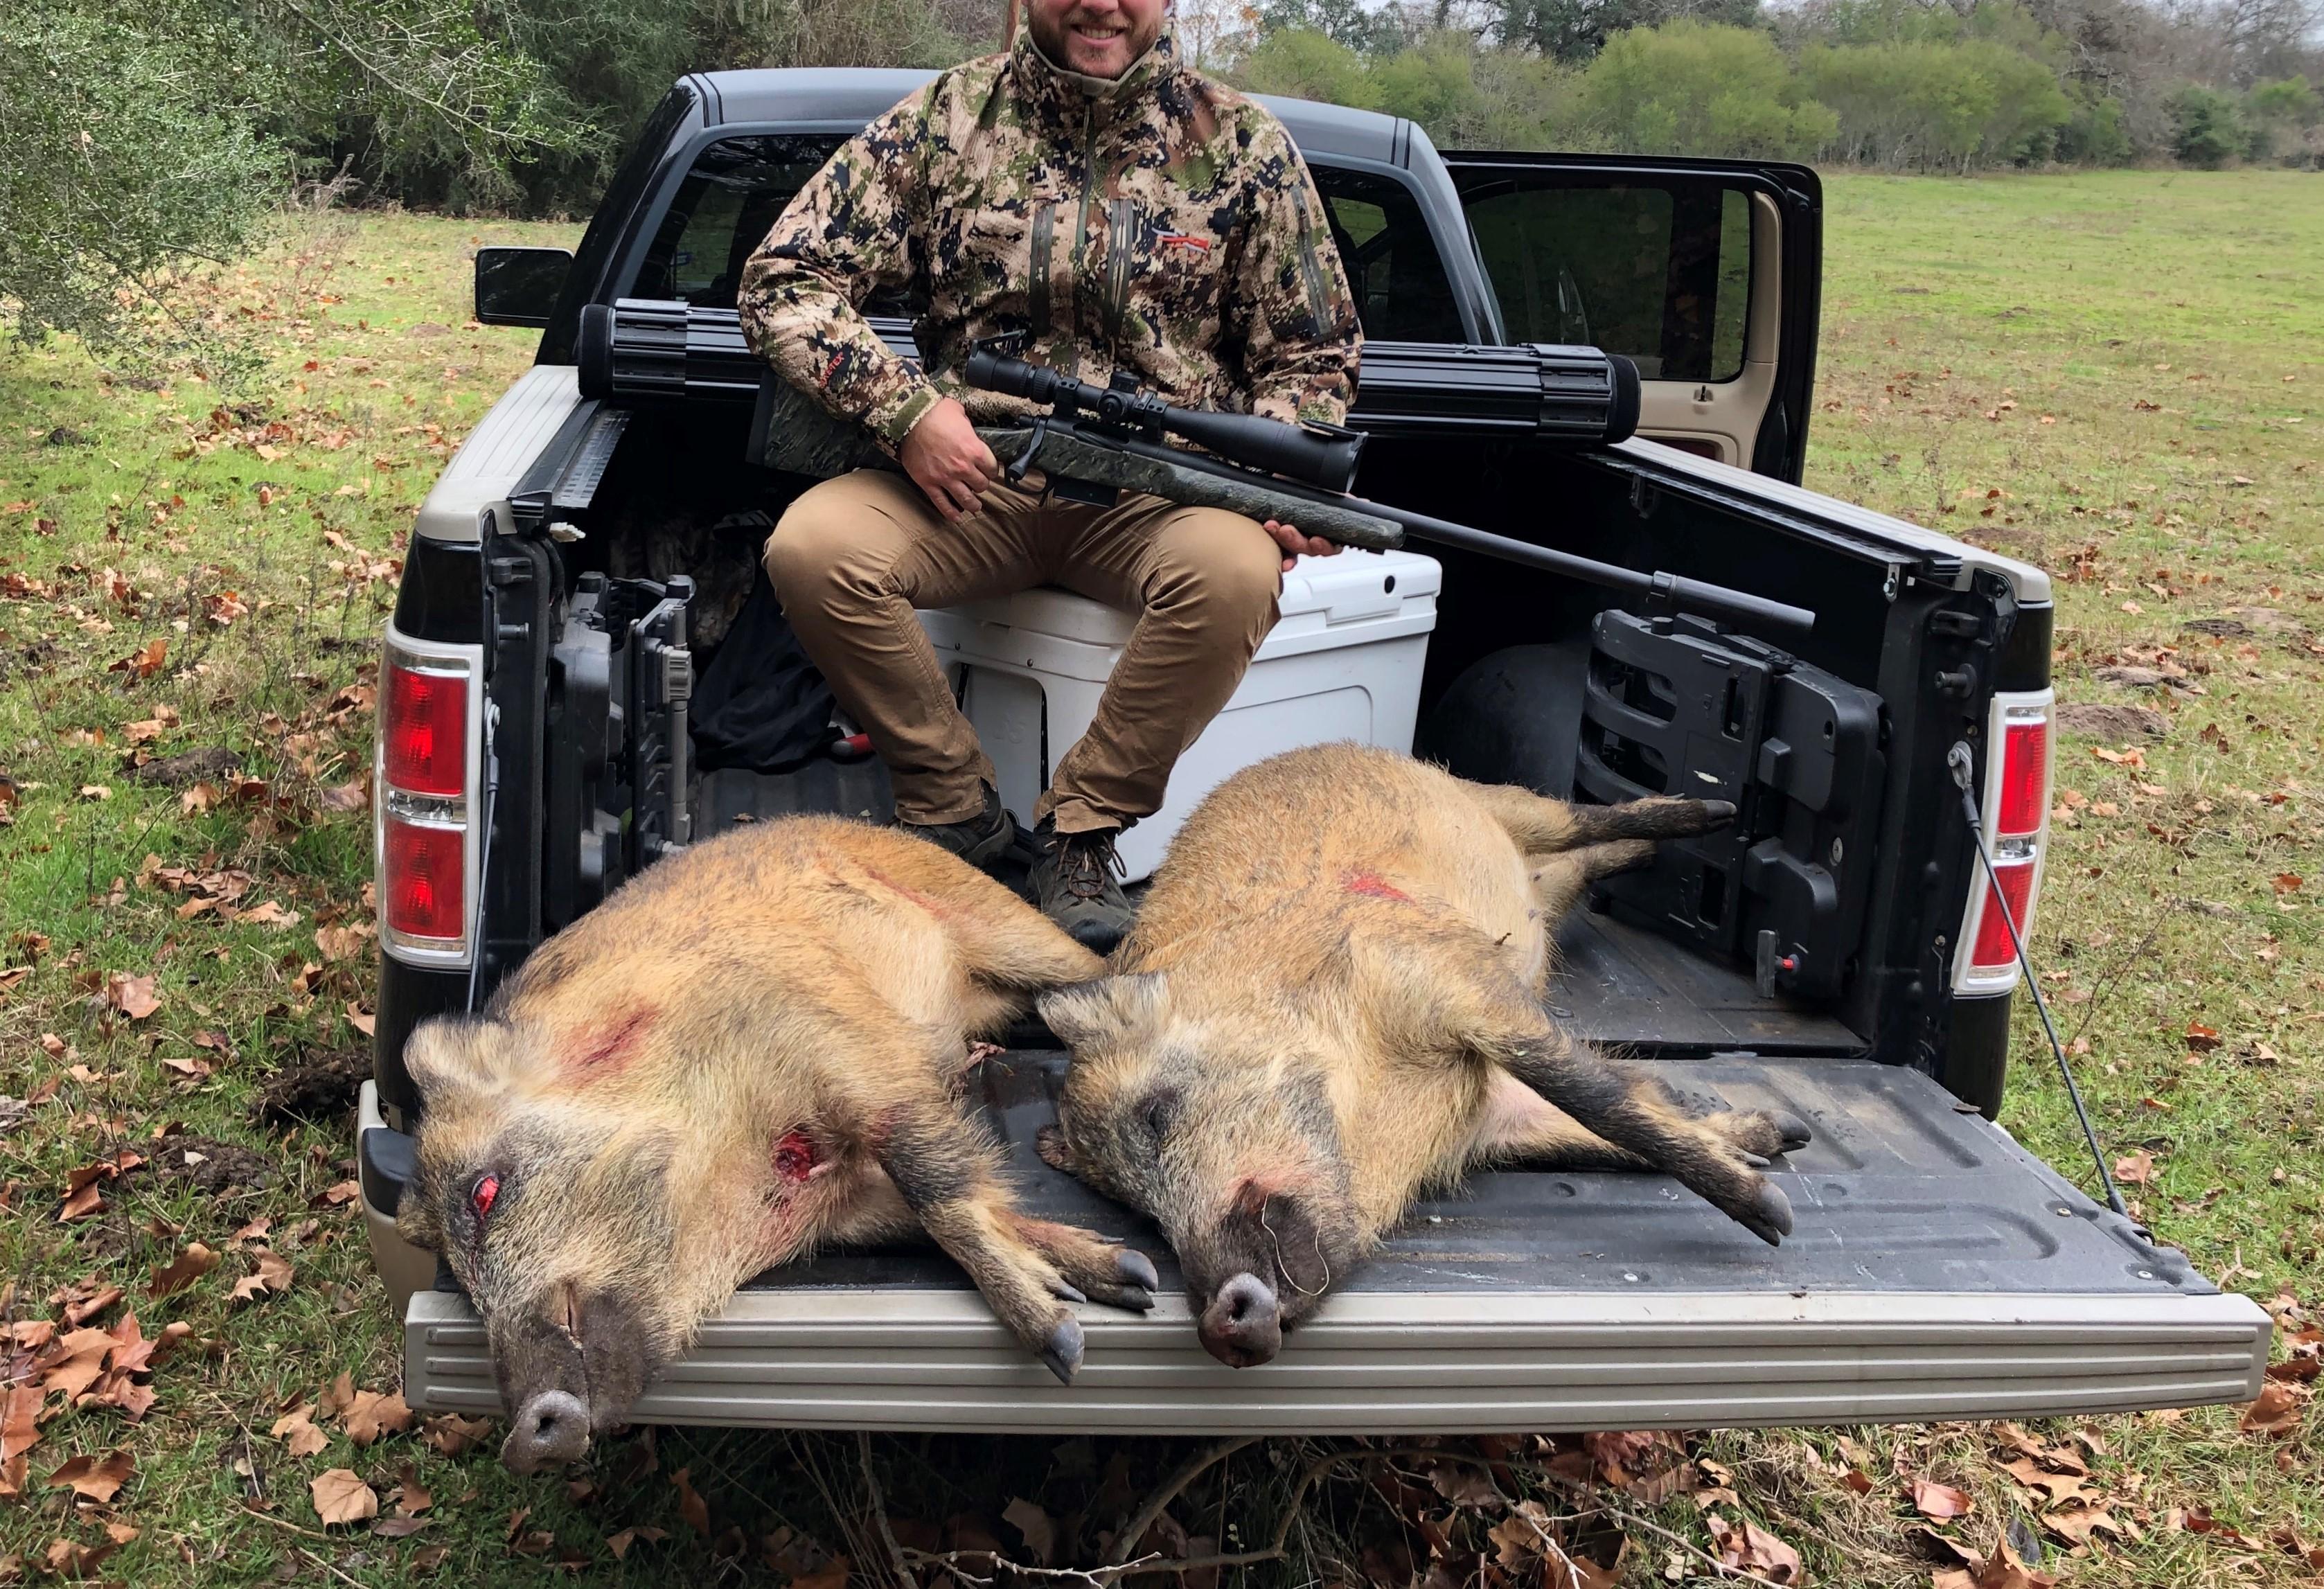 Hogs_20191223.jpg